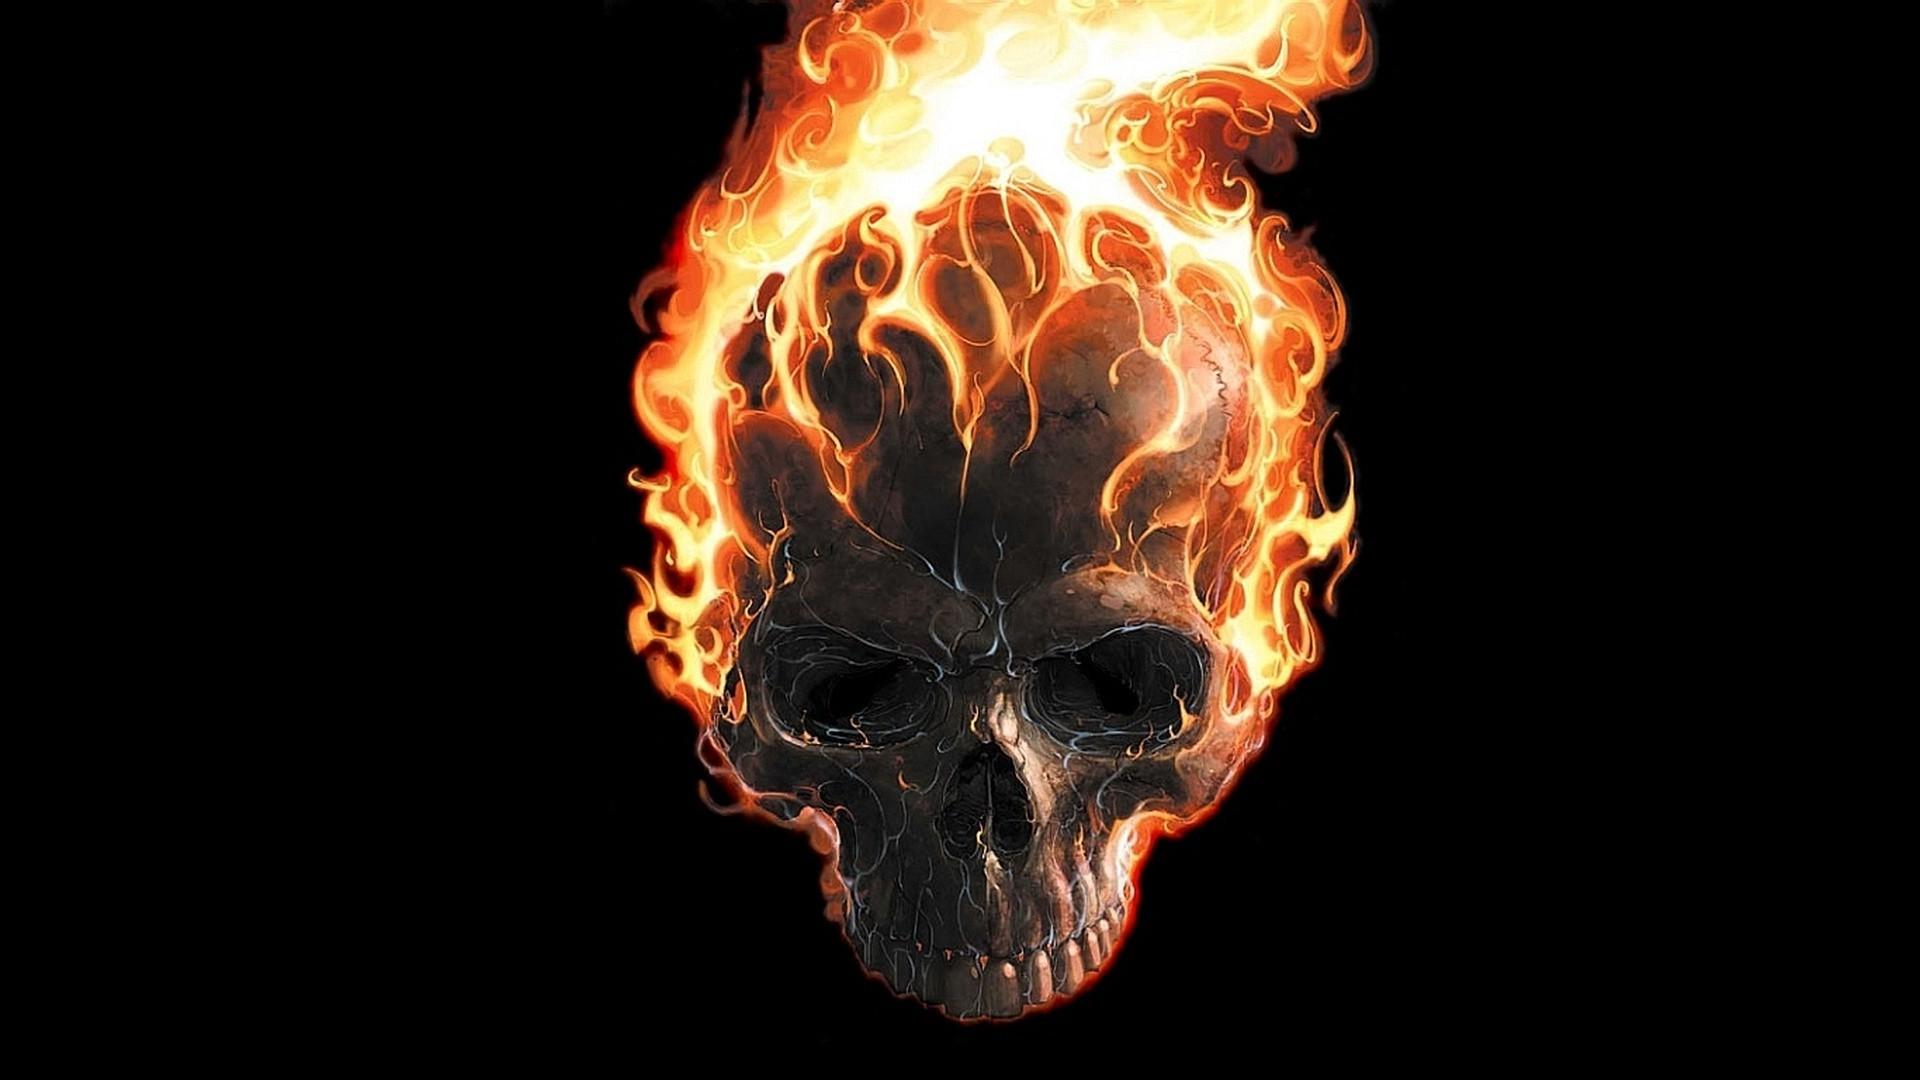 Wallpaper Digital Art Black Background Minimalism Movie Poster Fire Marvel Comics Skull Teeth Ghost Rider Burning Flame Darkness